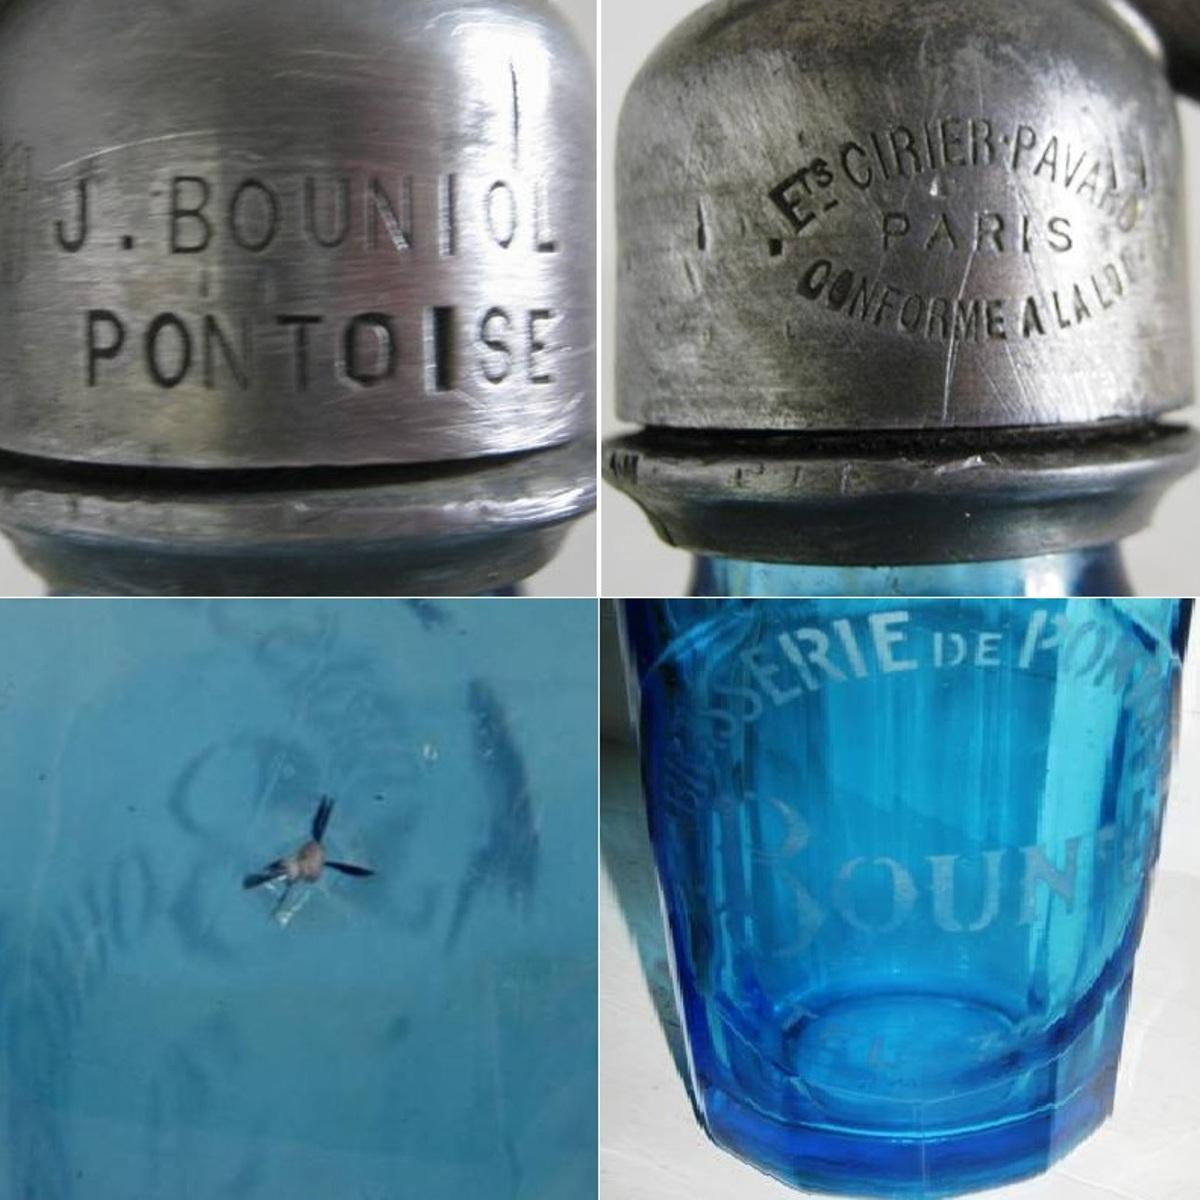 Siphon bouniol pontoise 3